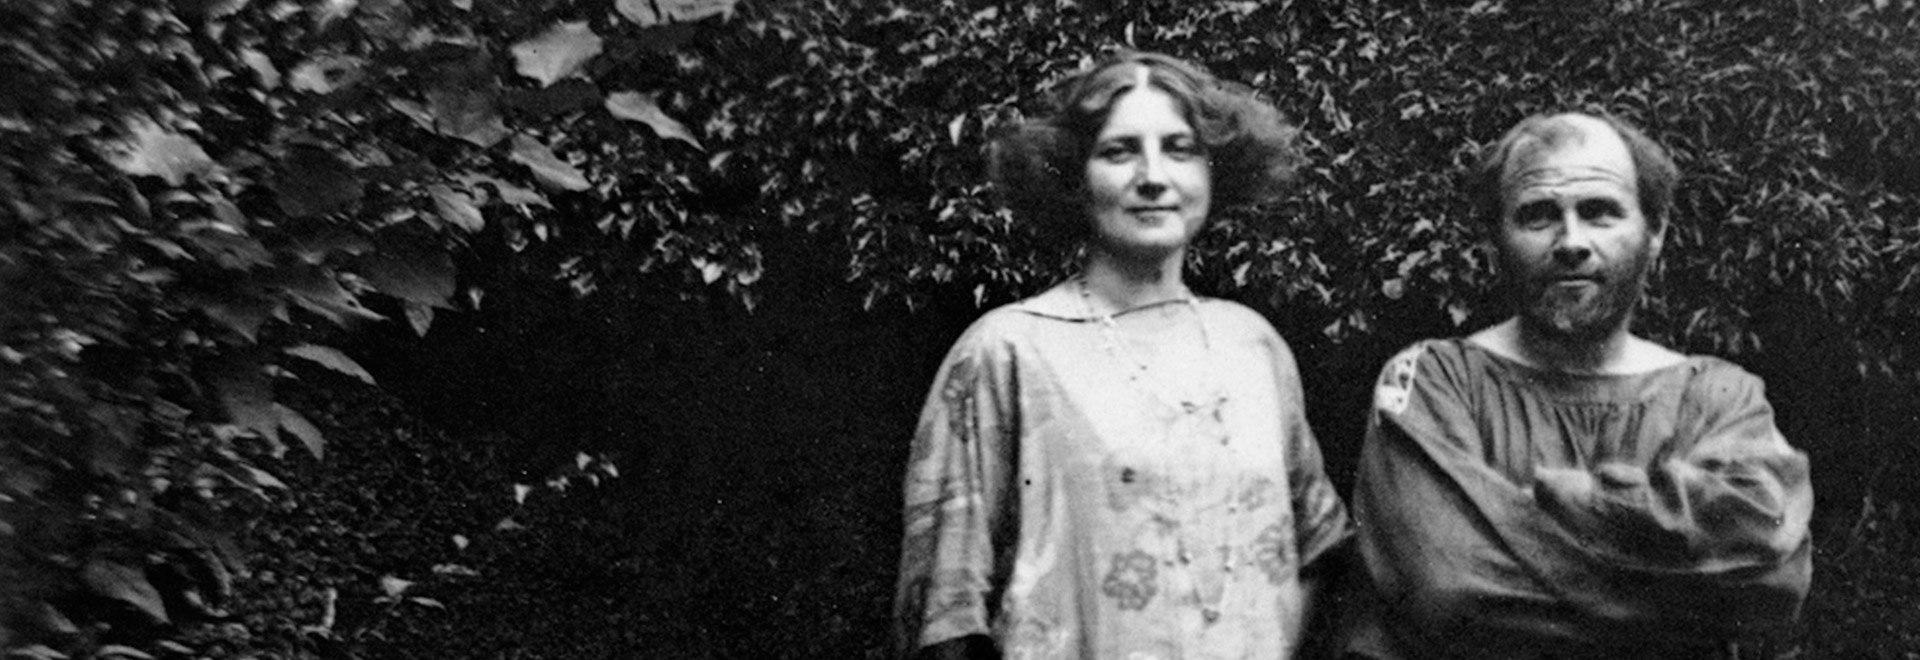 Emilie Floge e Gustav Klimt